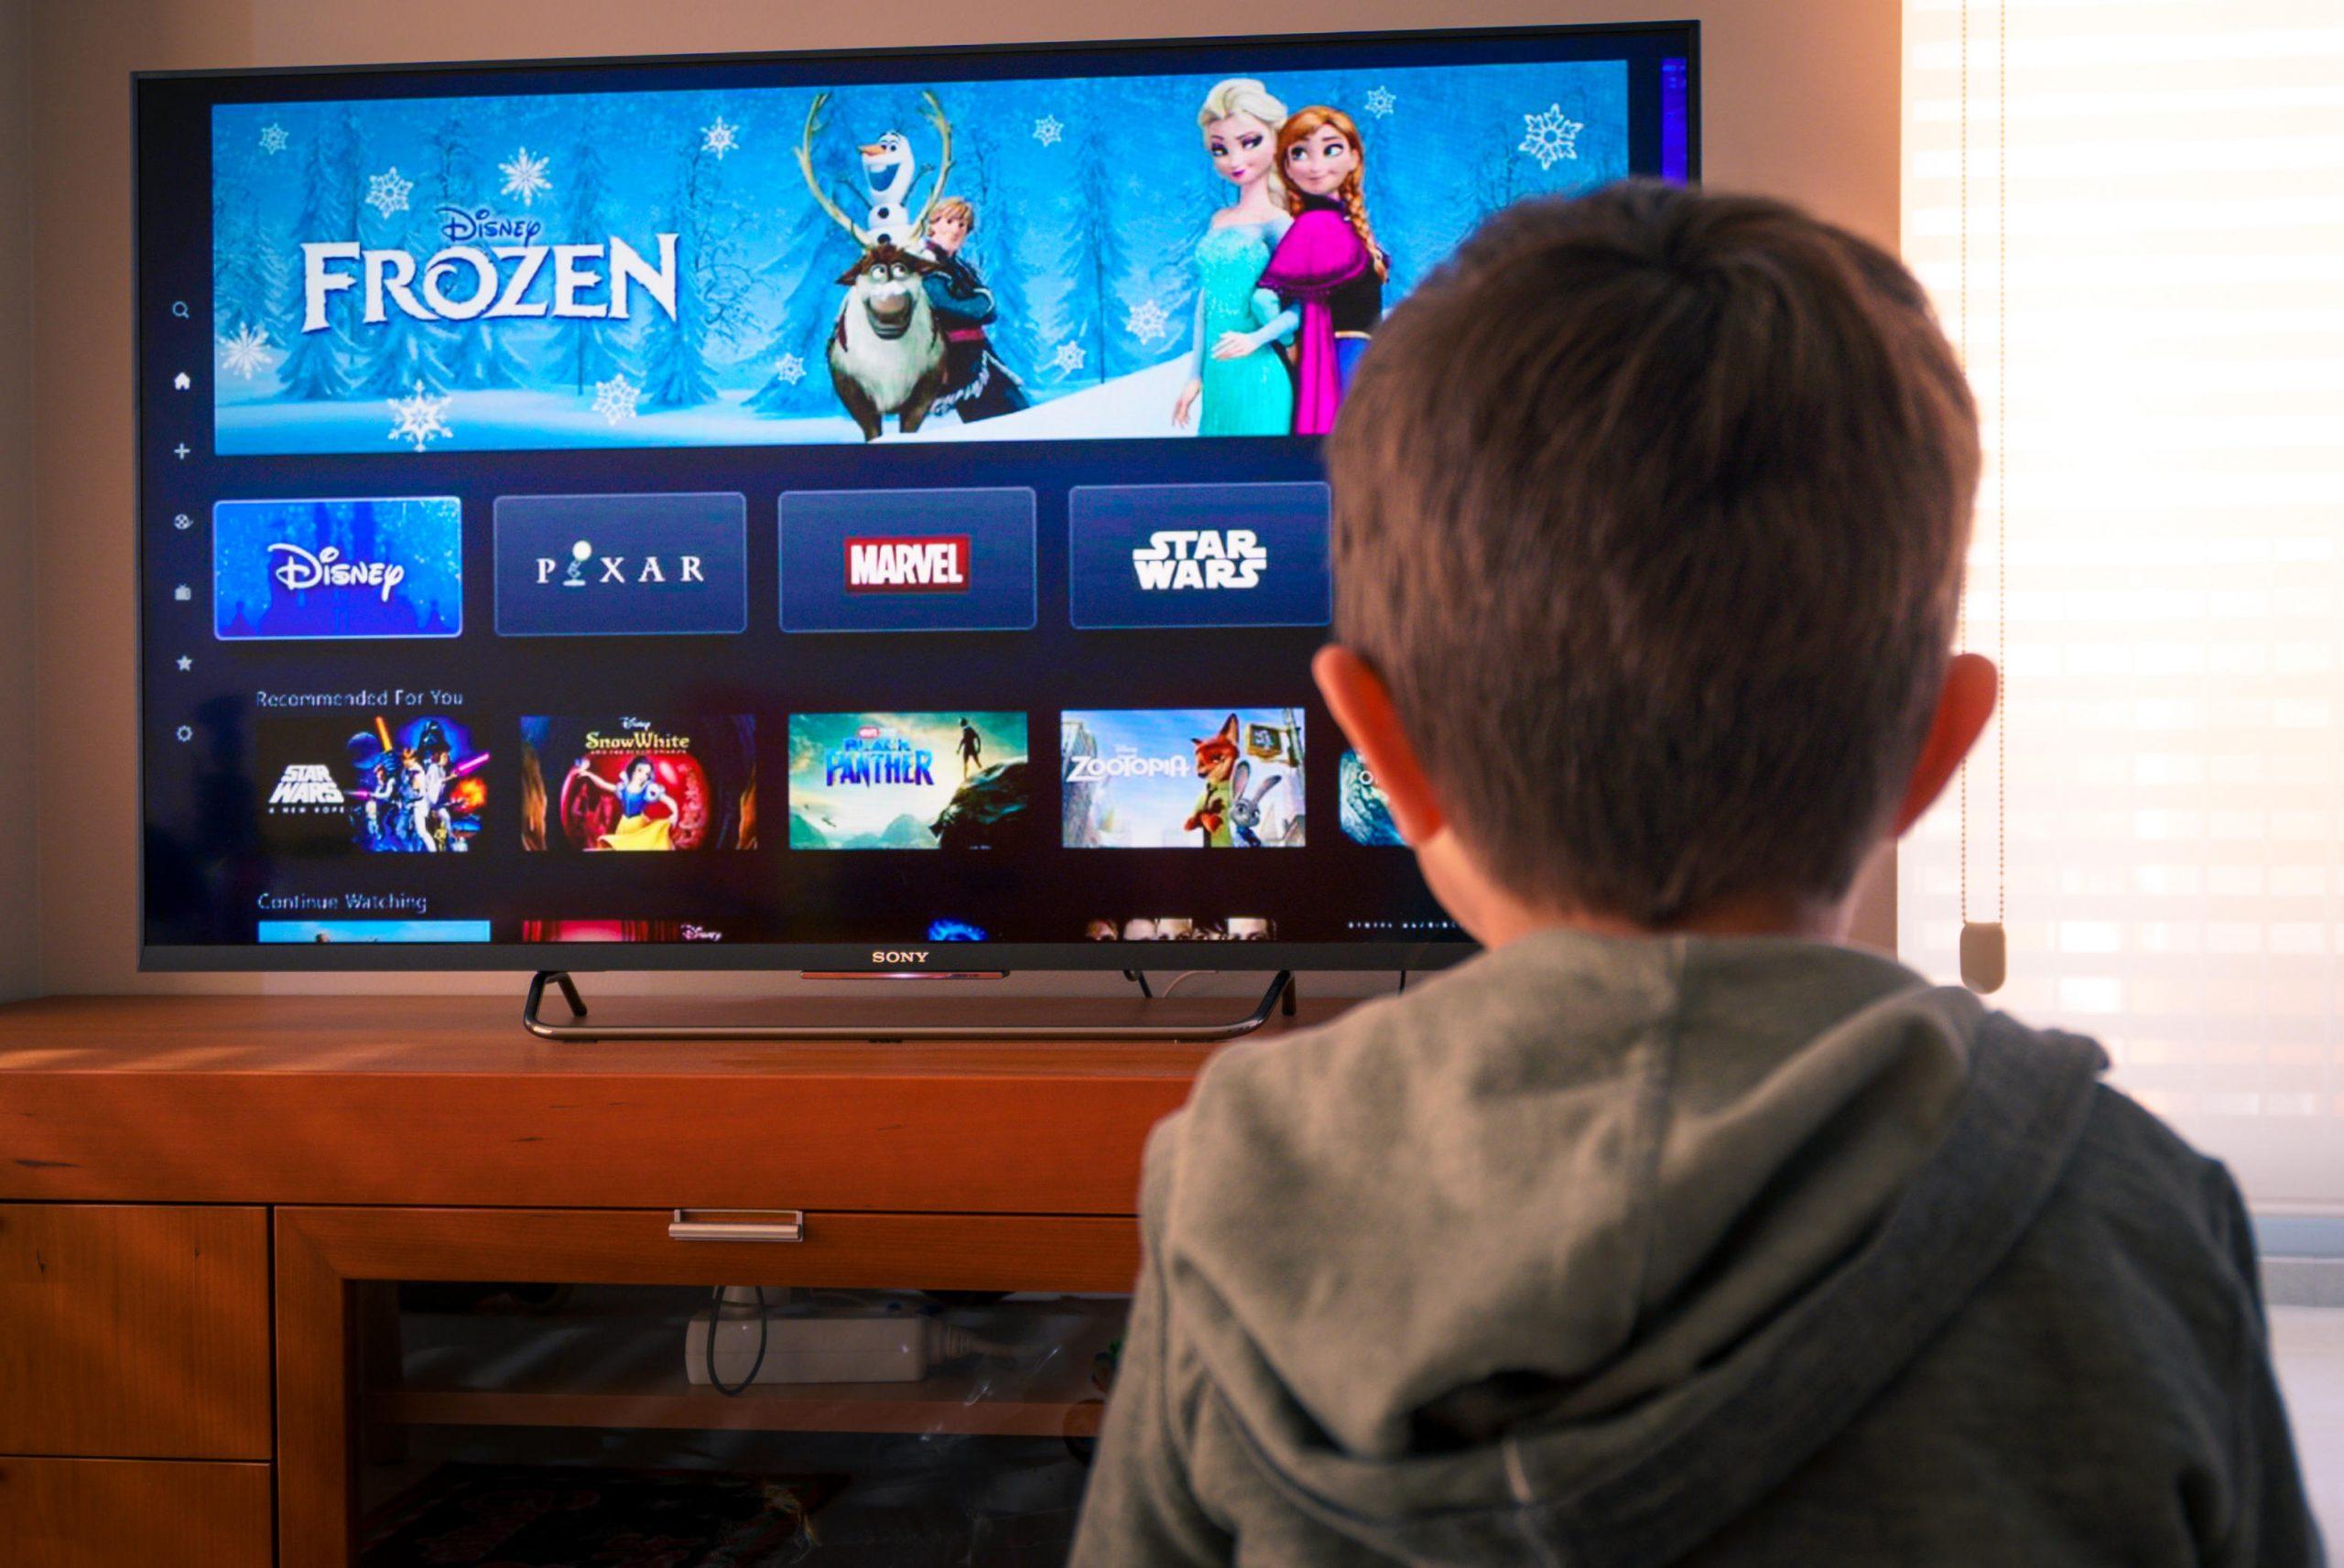 Disney+ empowering films for kids